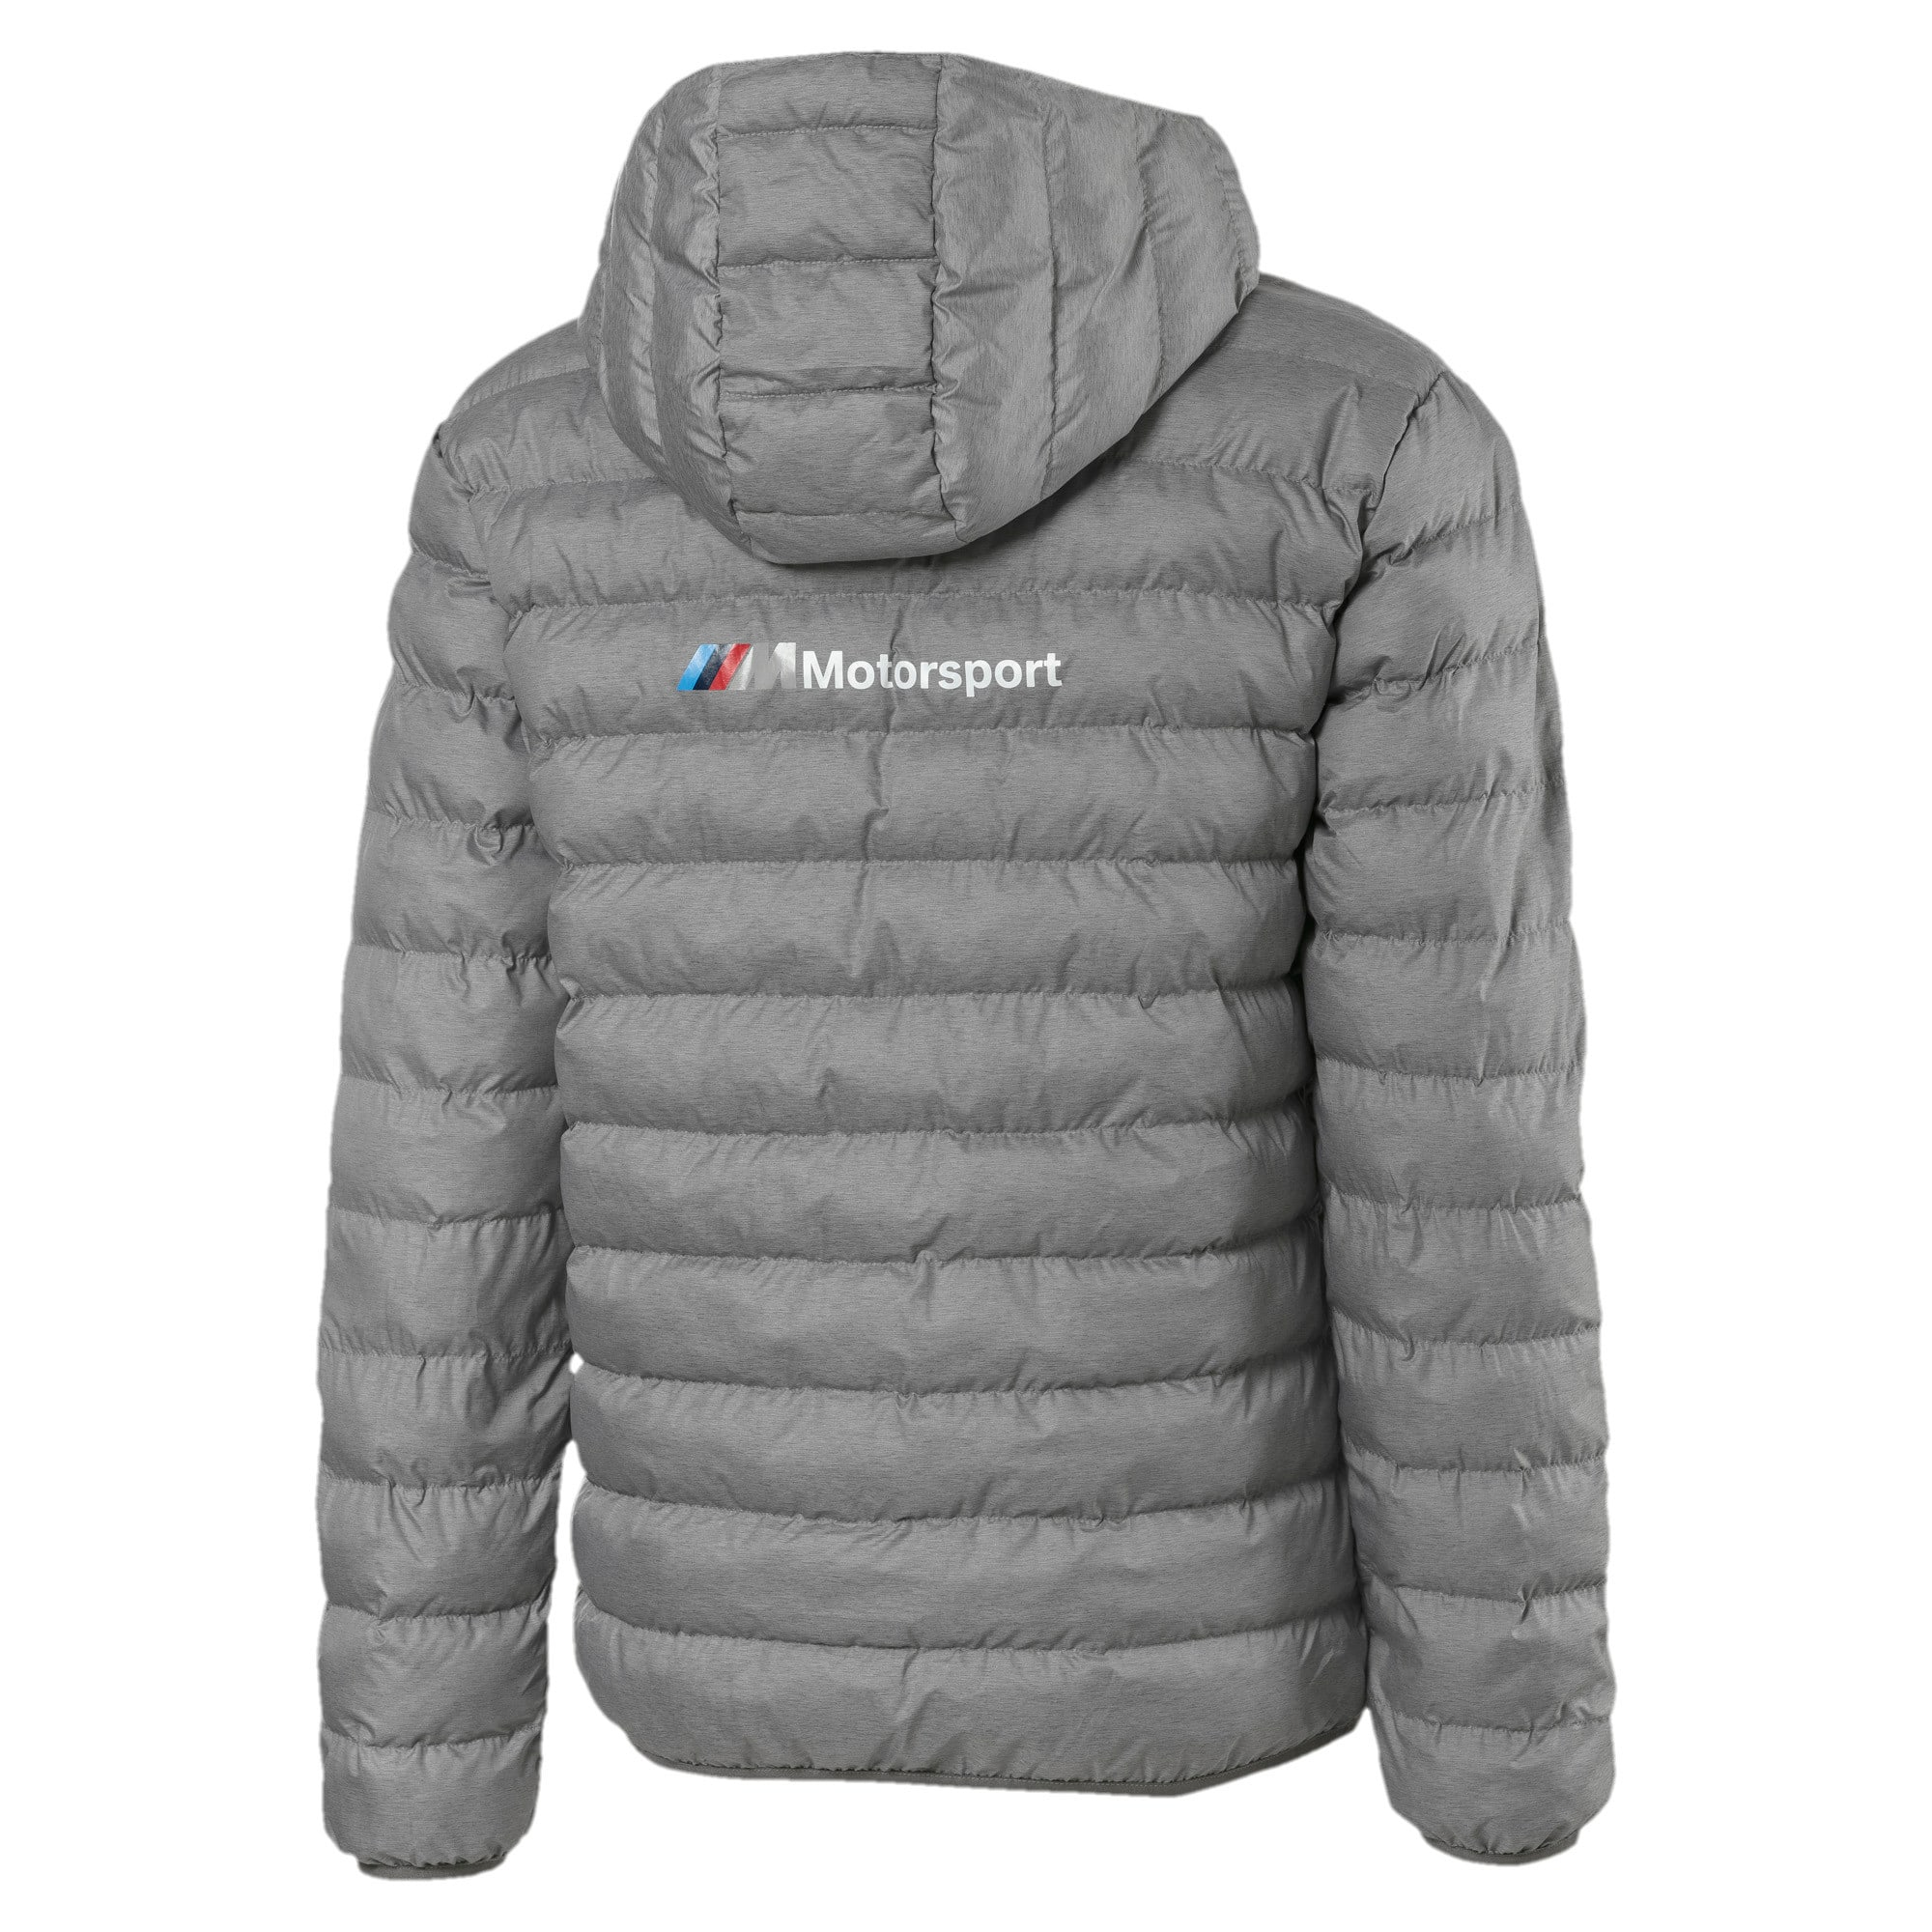 Thumbnail 6 of BMW Motorsport Eco PackLite Men's Jacket, Medium Gray Heather, medium